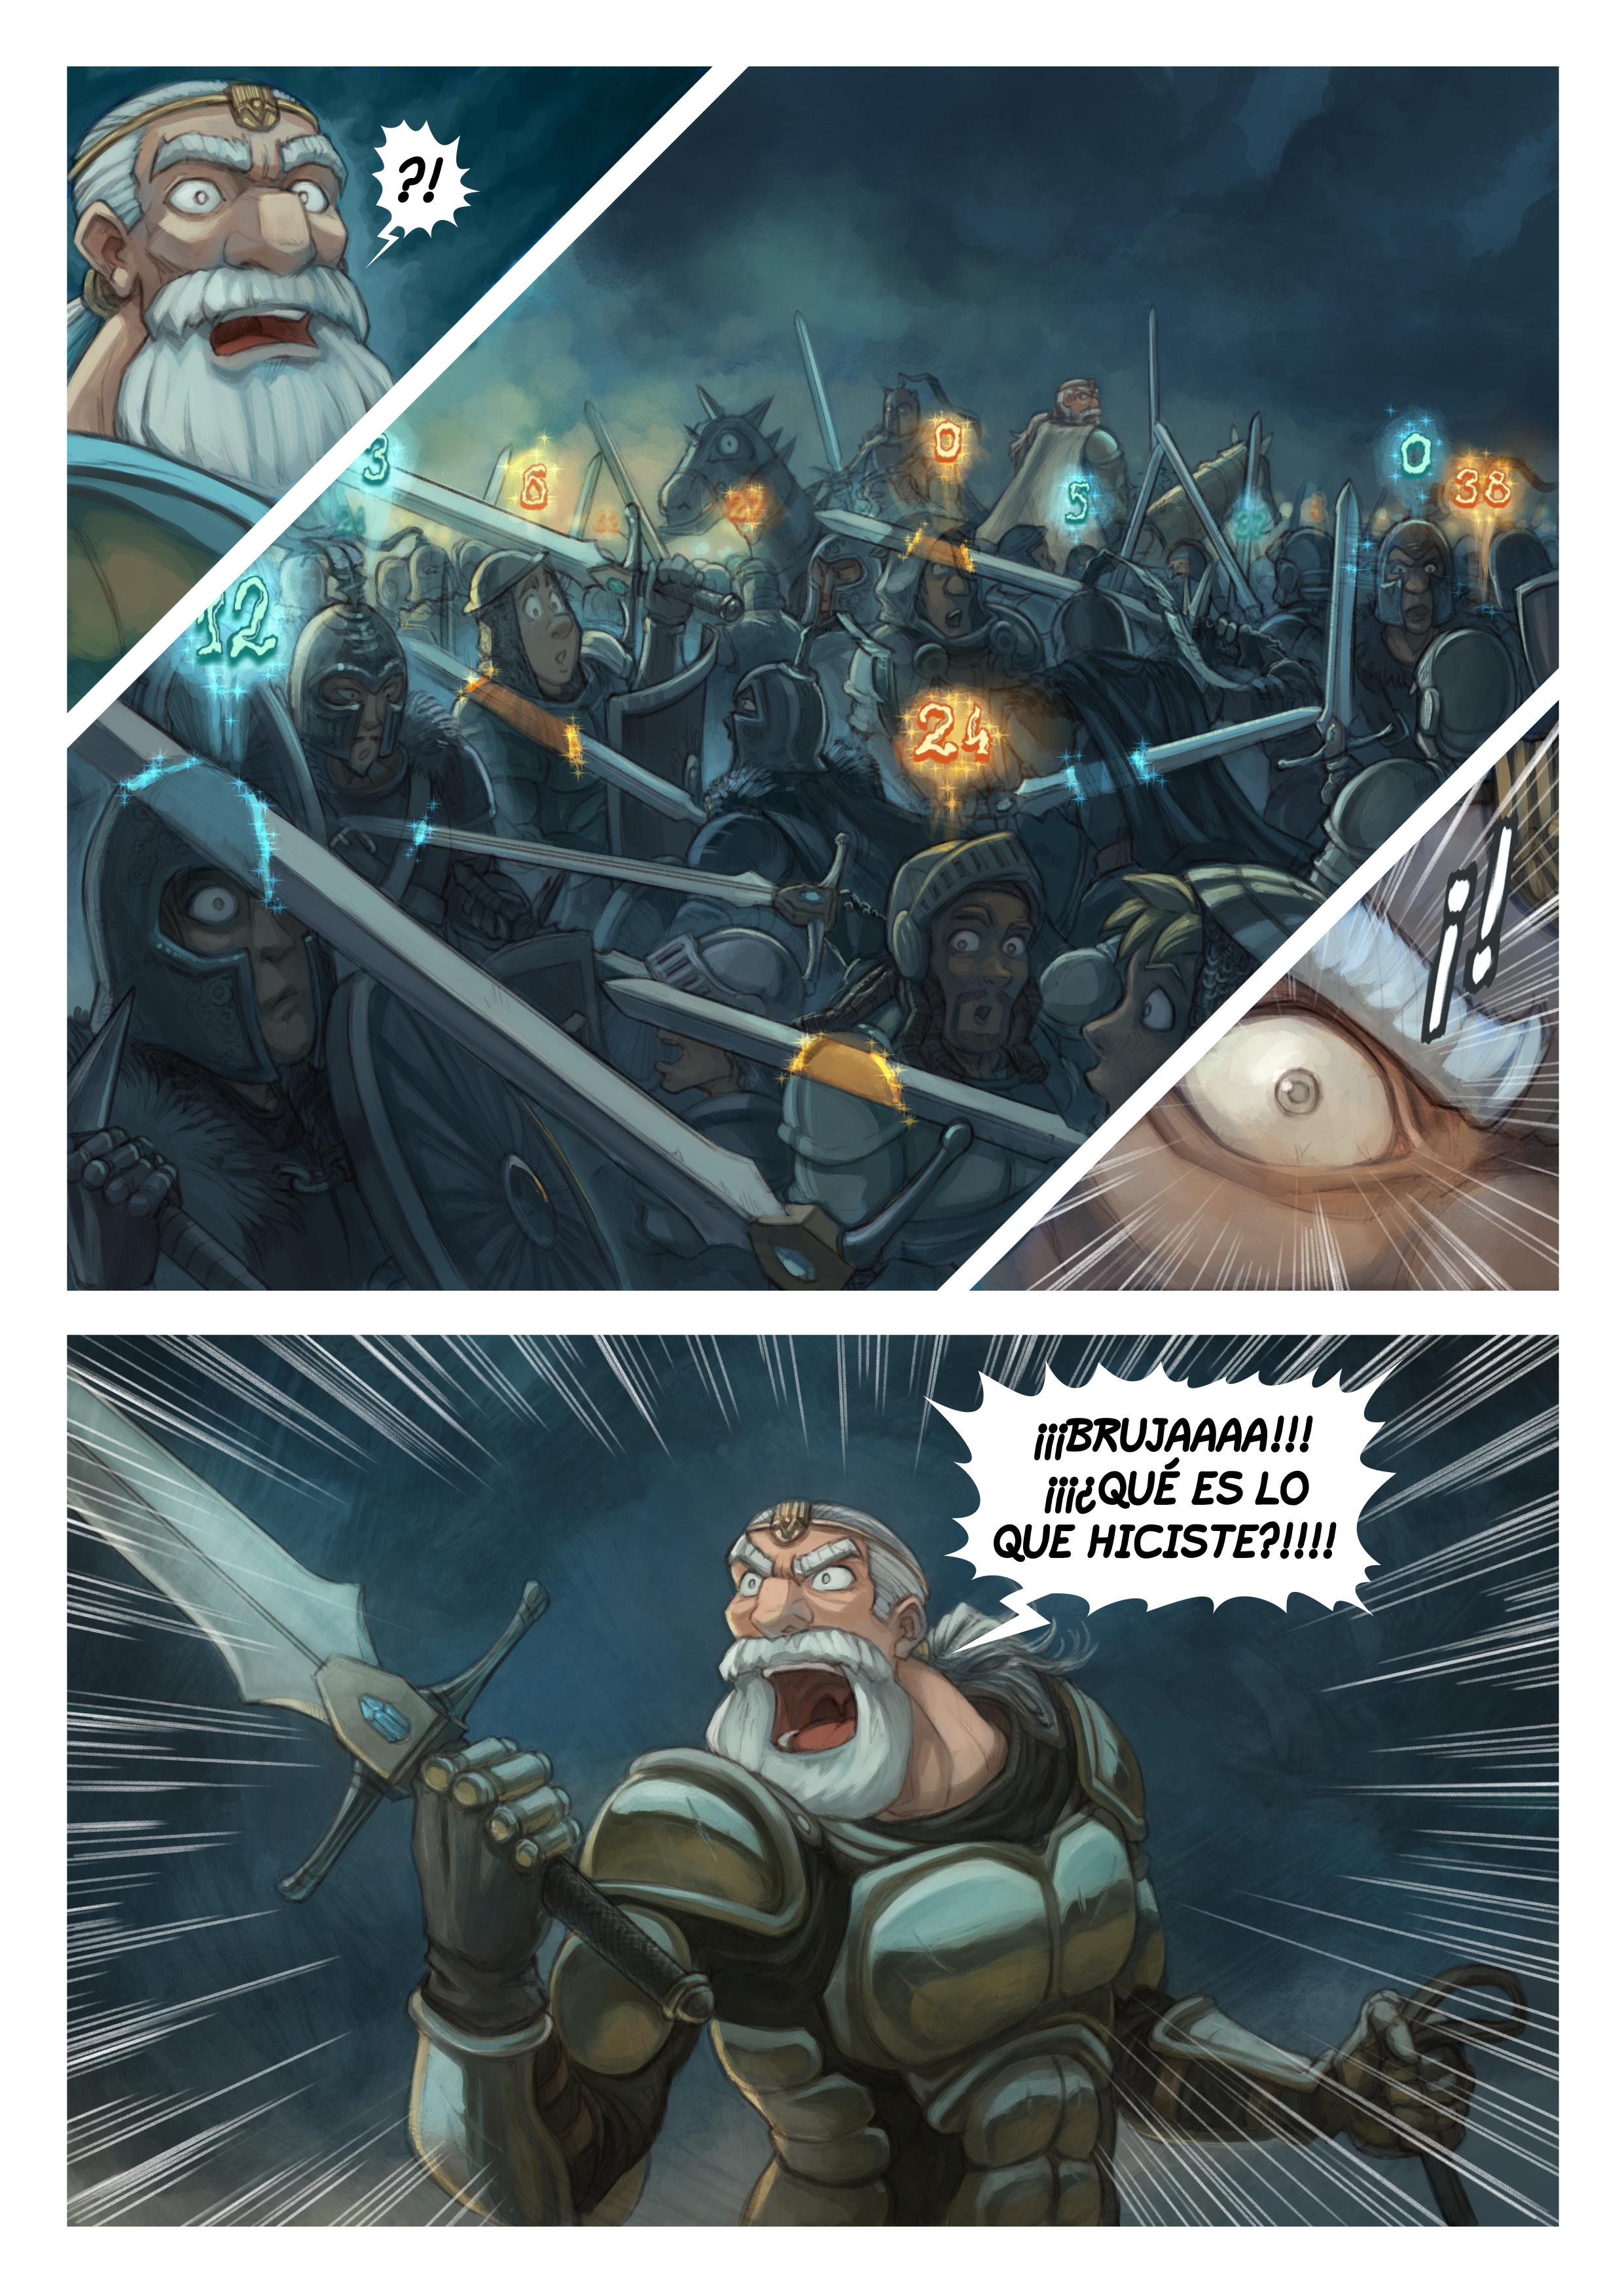 Episodio 33: Hechizo de guerra, Page 6